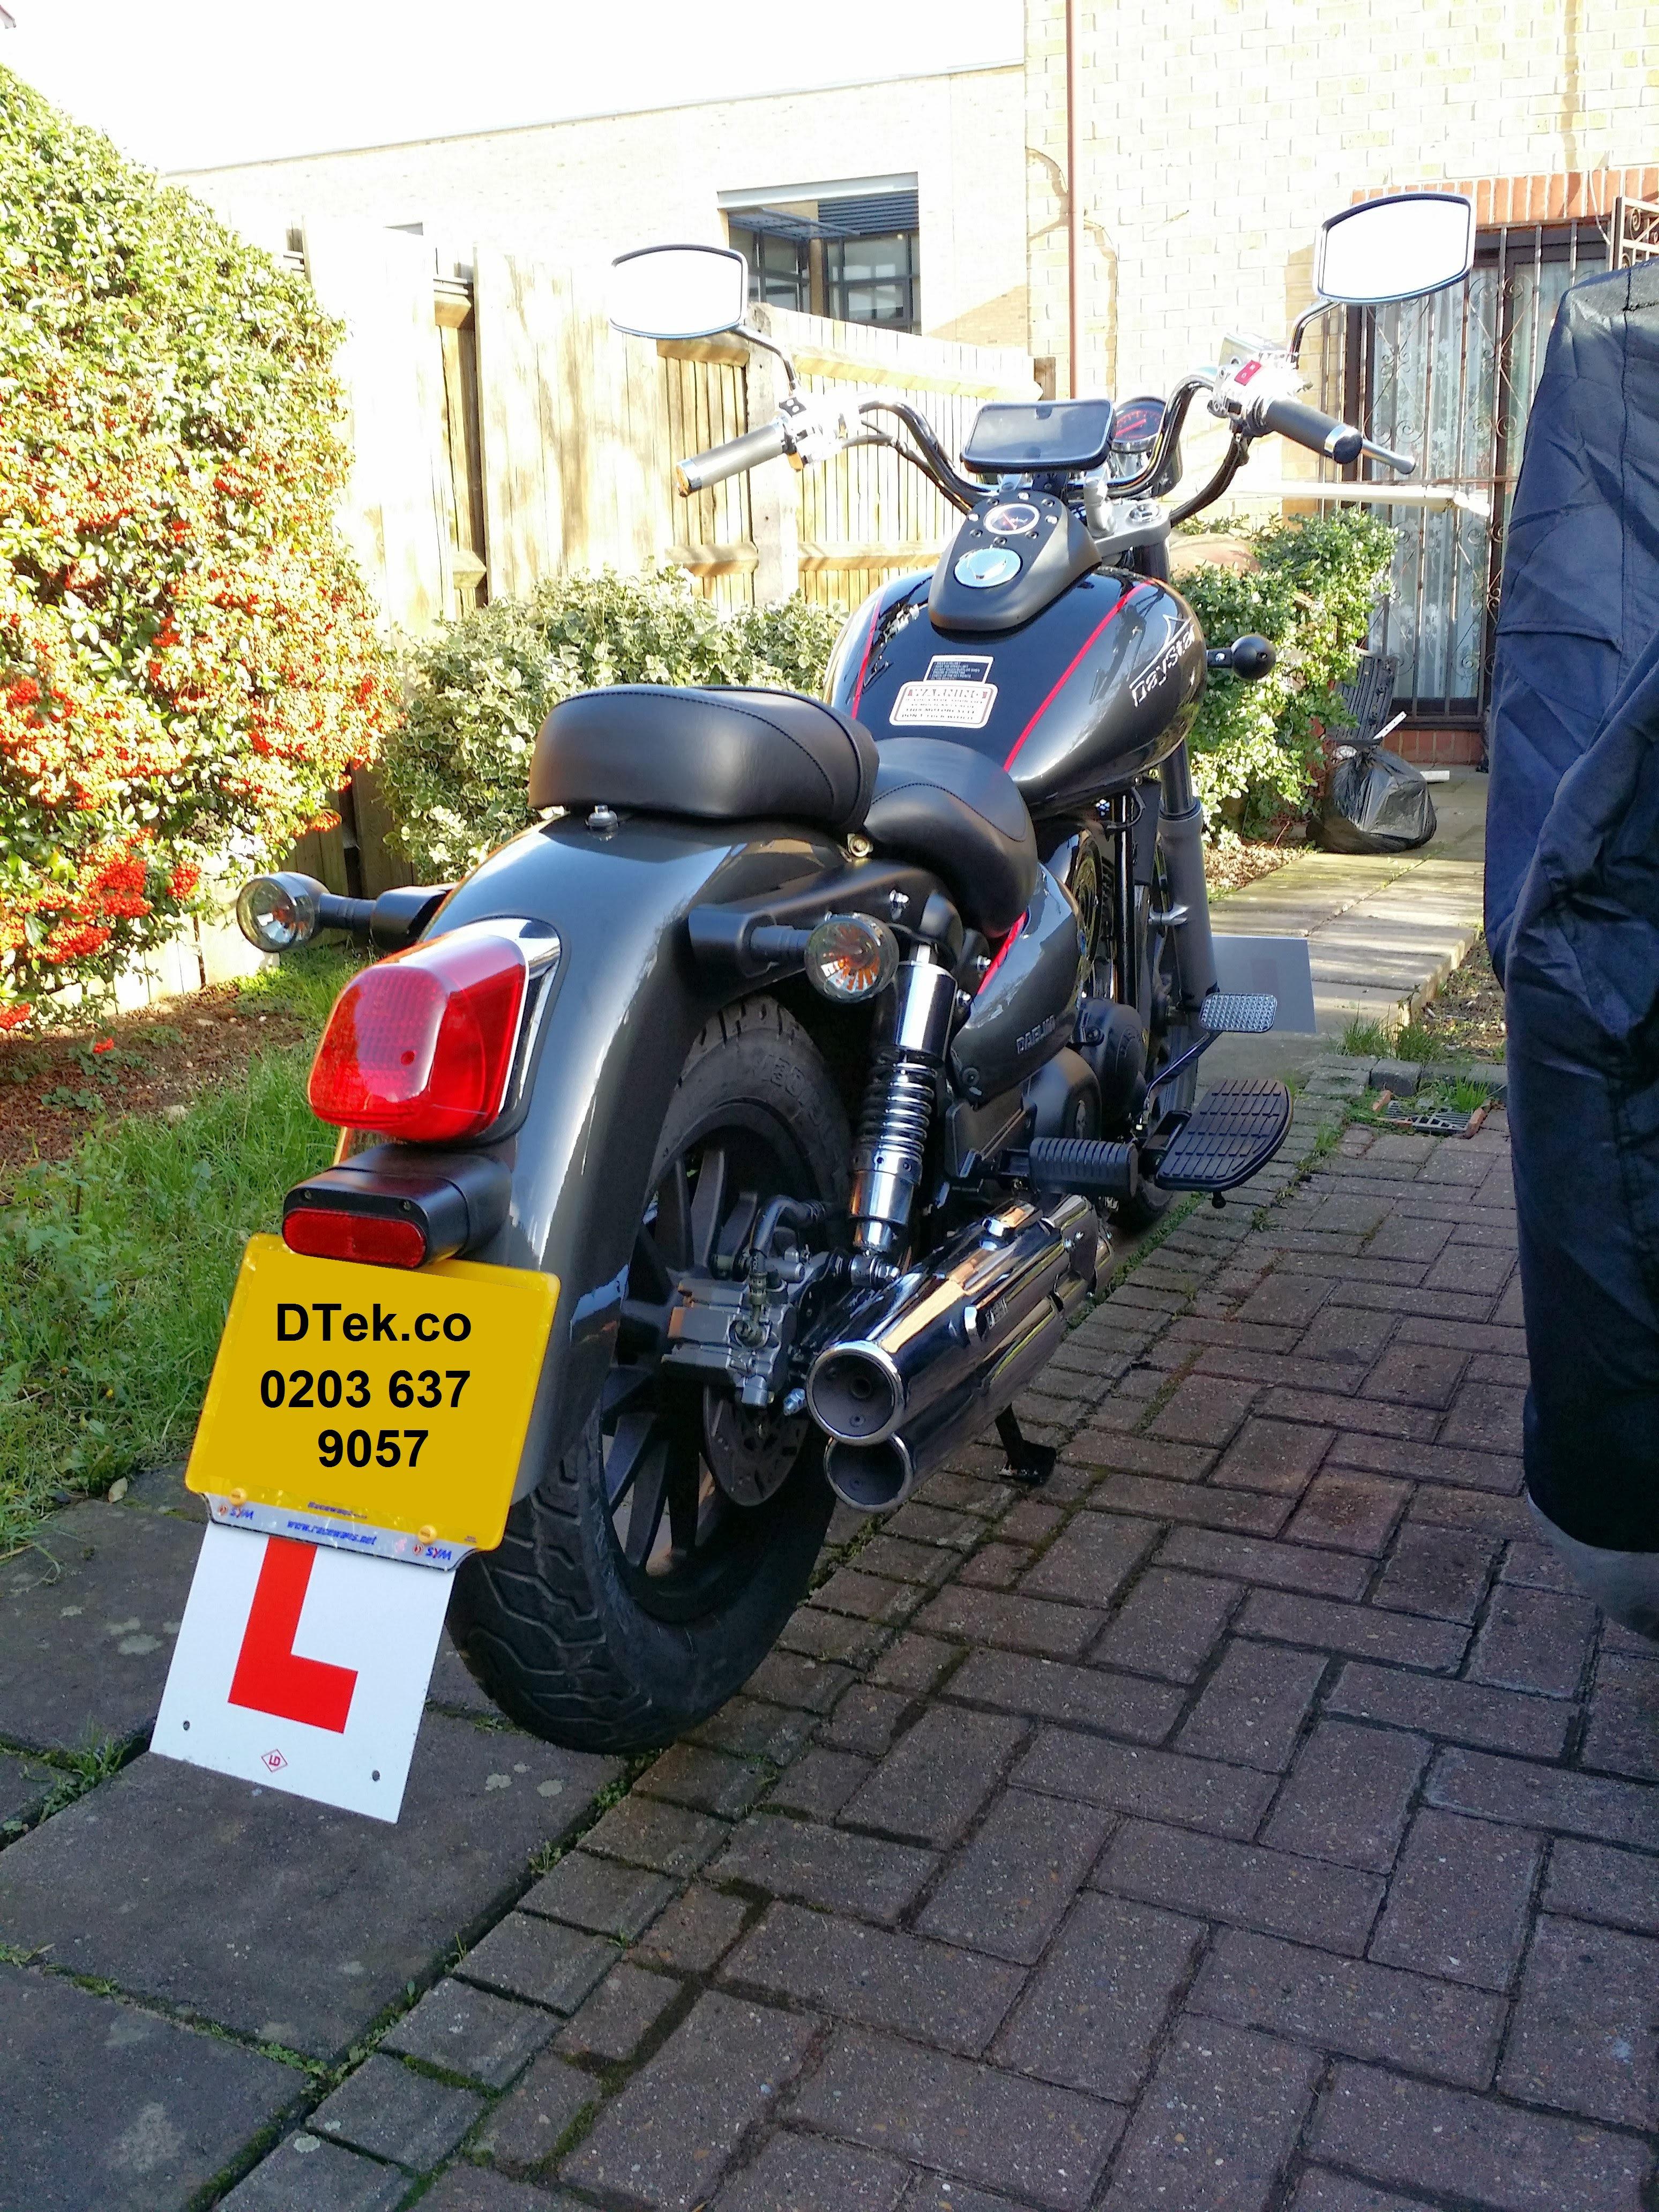 Motorbike GPS Tracker + Fitting